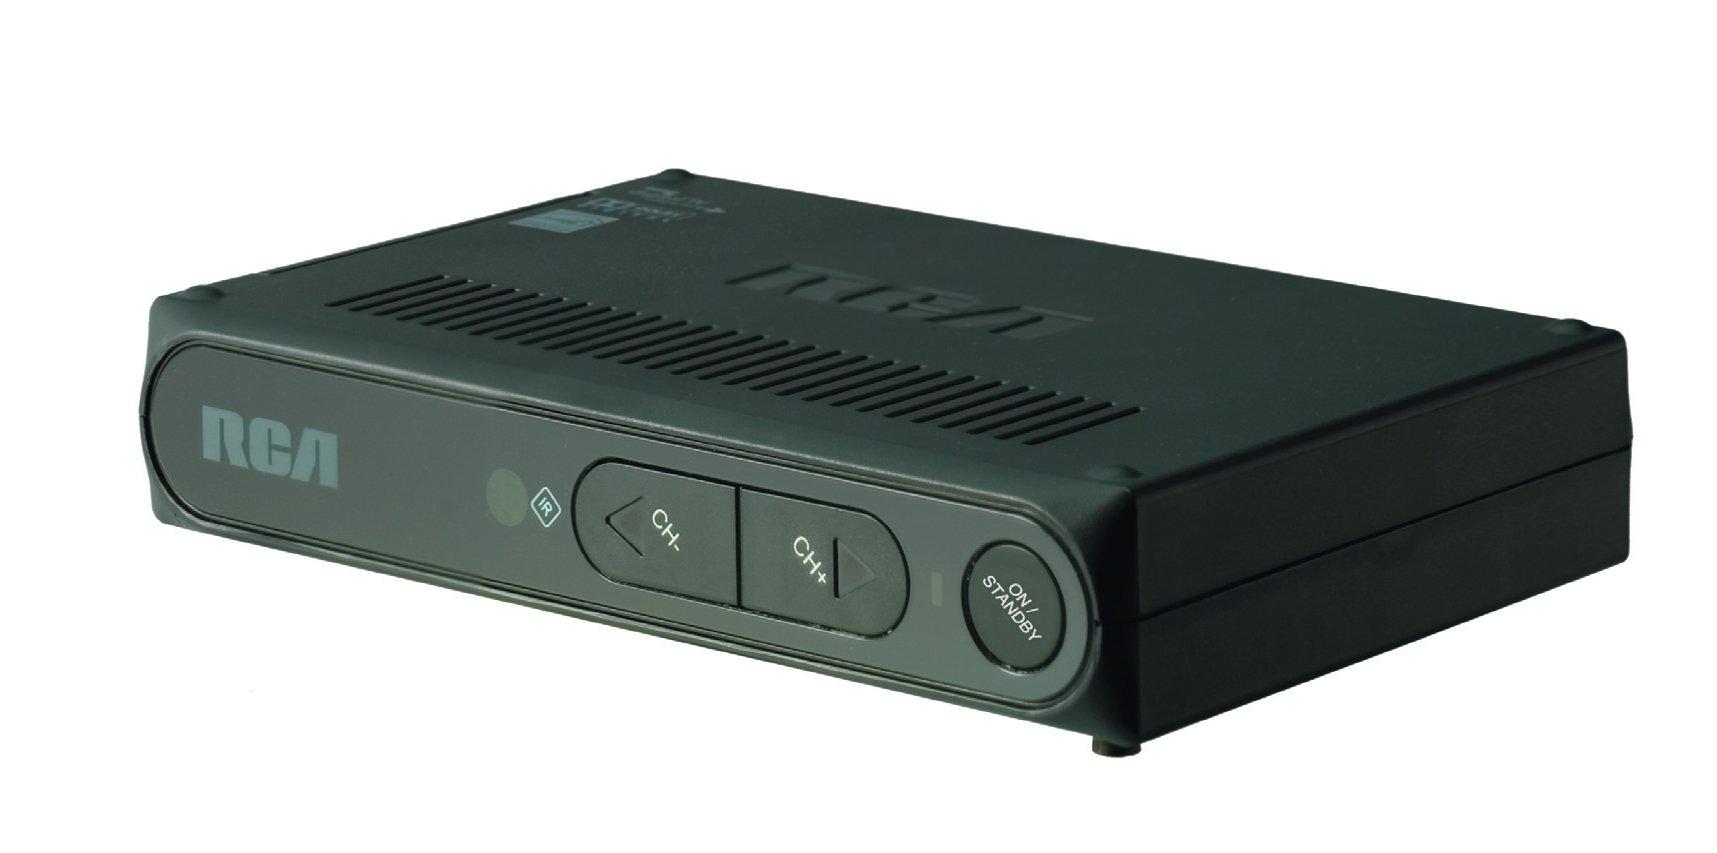 RCA DTA-800B1 Digital To Analog Pass-through TV Converter Box by RCA